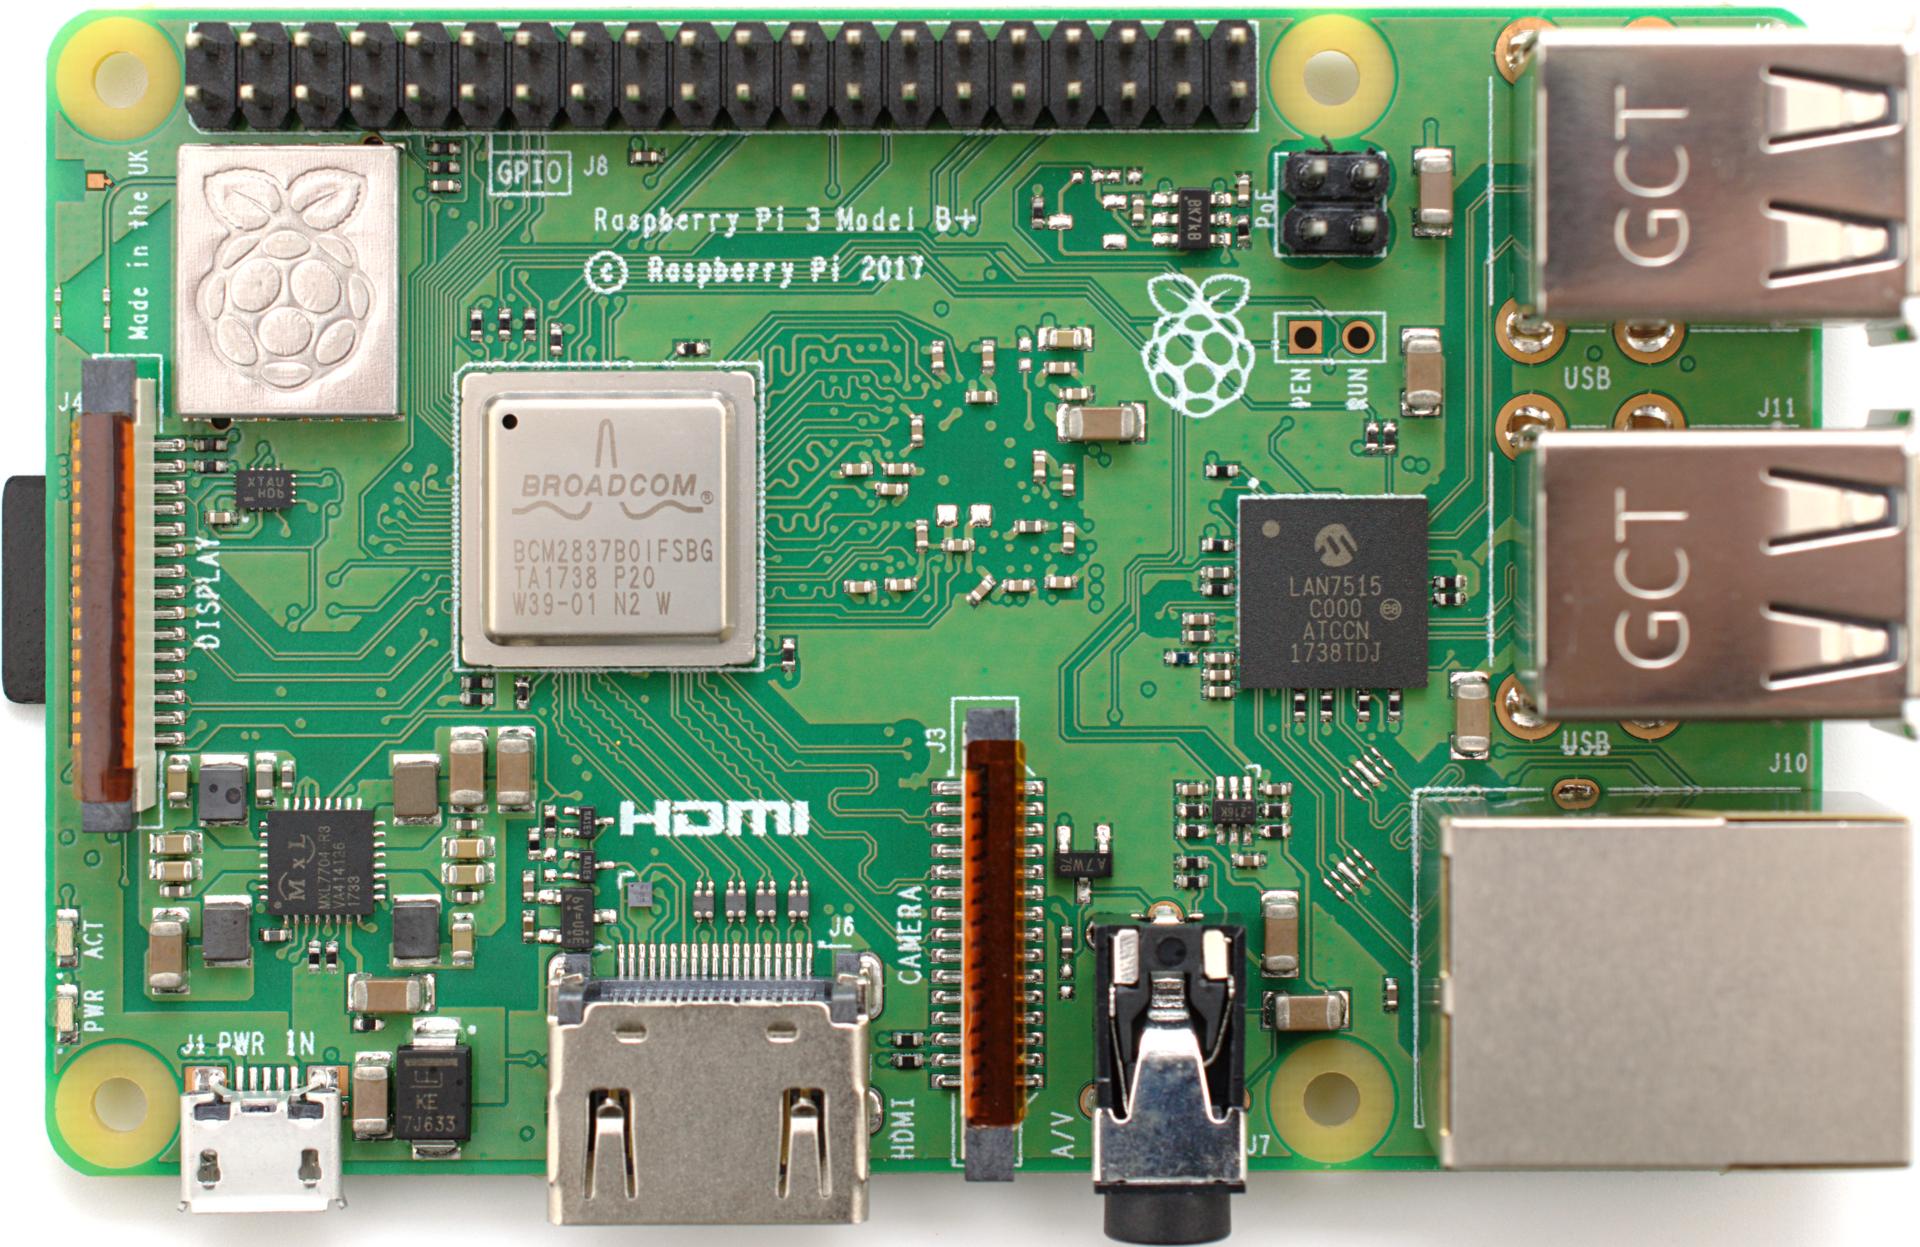 Raspberry Pi 3 Model B+.